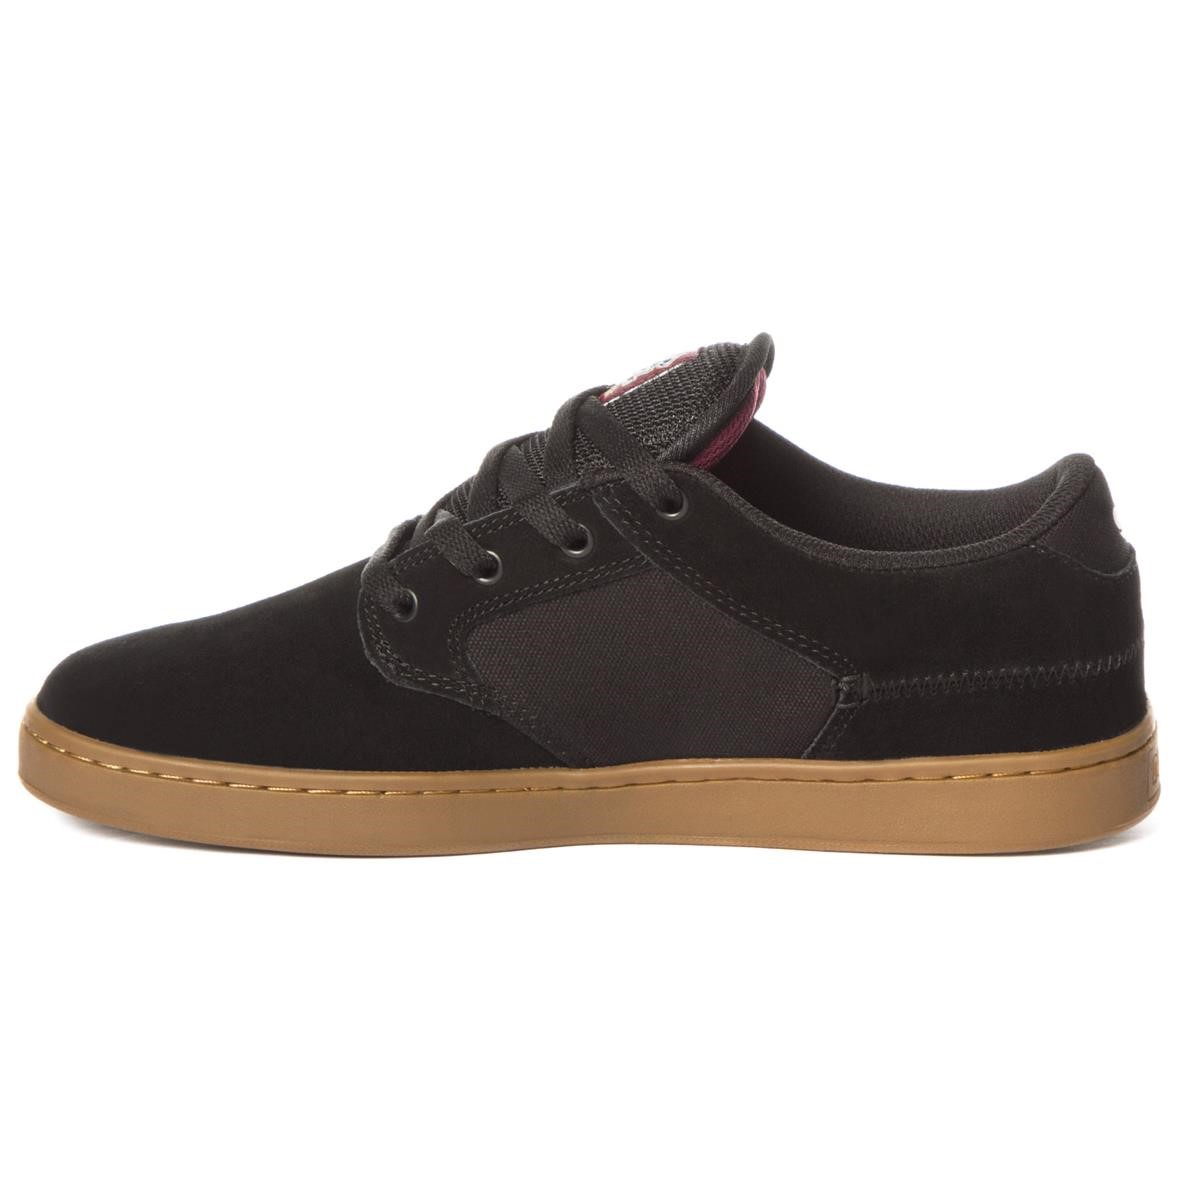 best service 6ade0 069f5 ... Nike Air Python Premium Mens Mens Mens 705066-102 Sail Gold Snakeskin  Shoes Size 10.5 ...